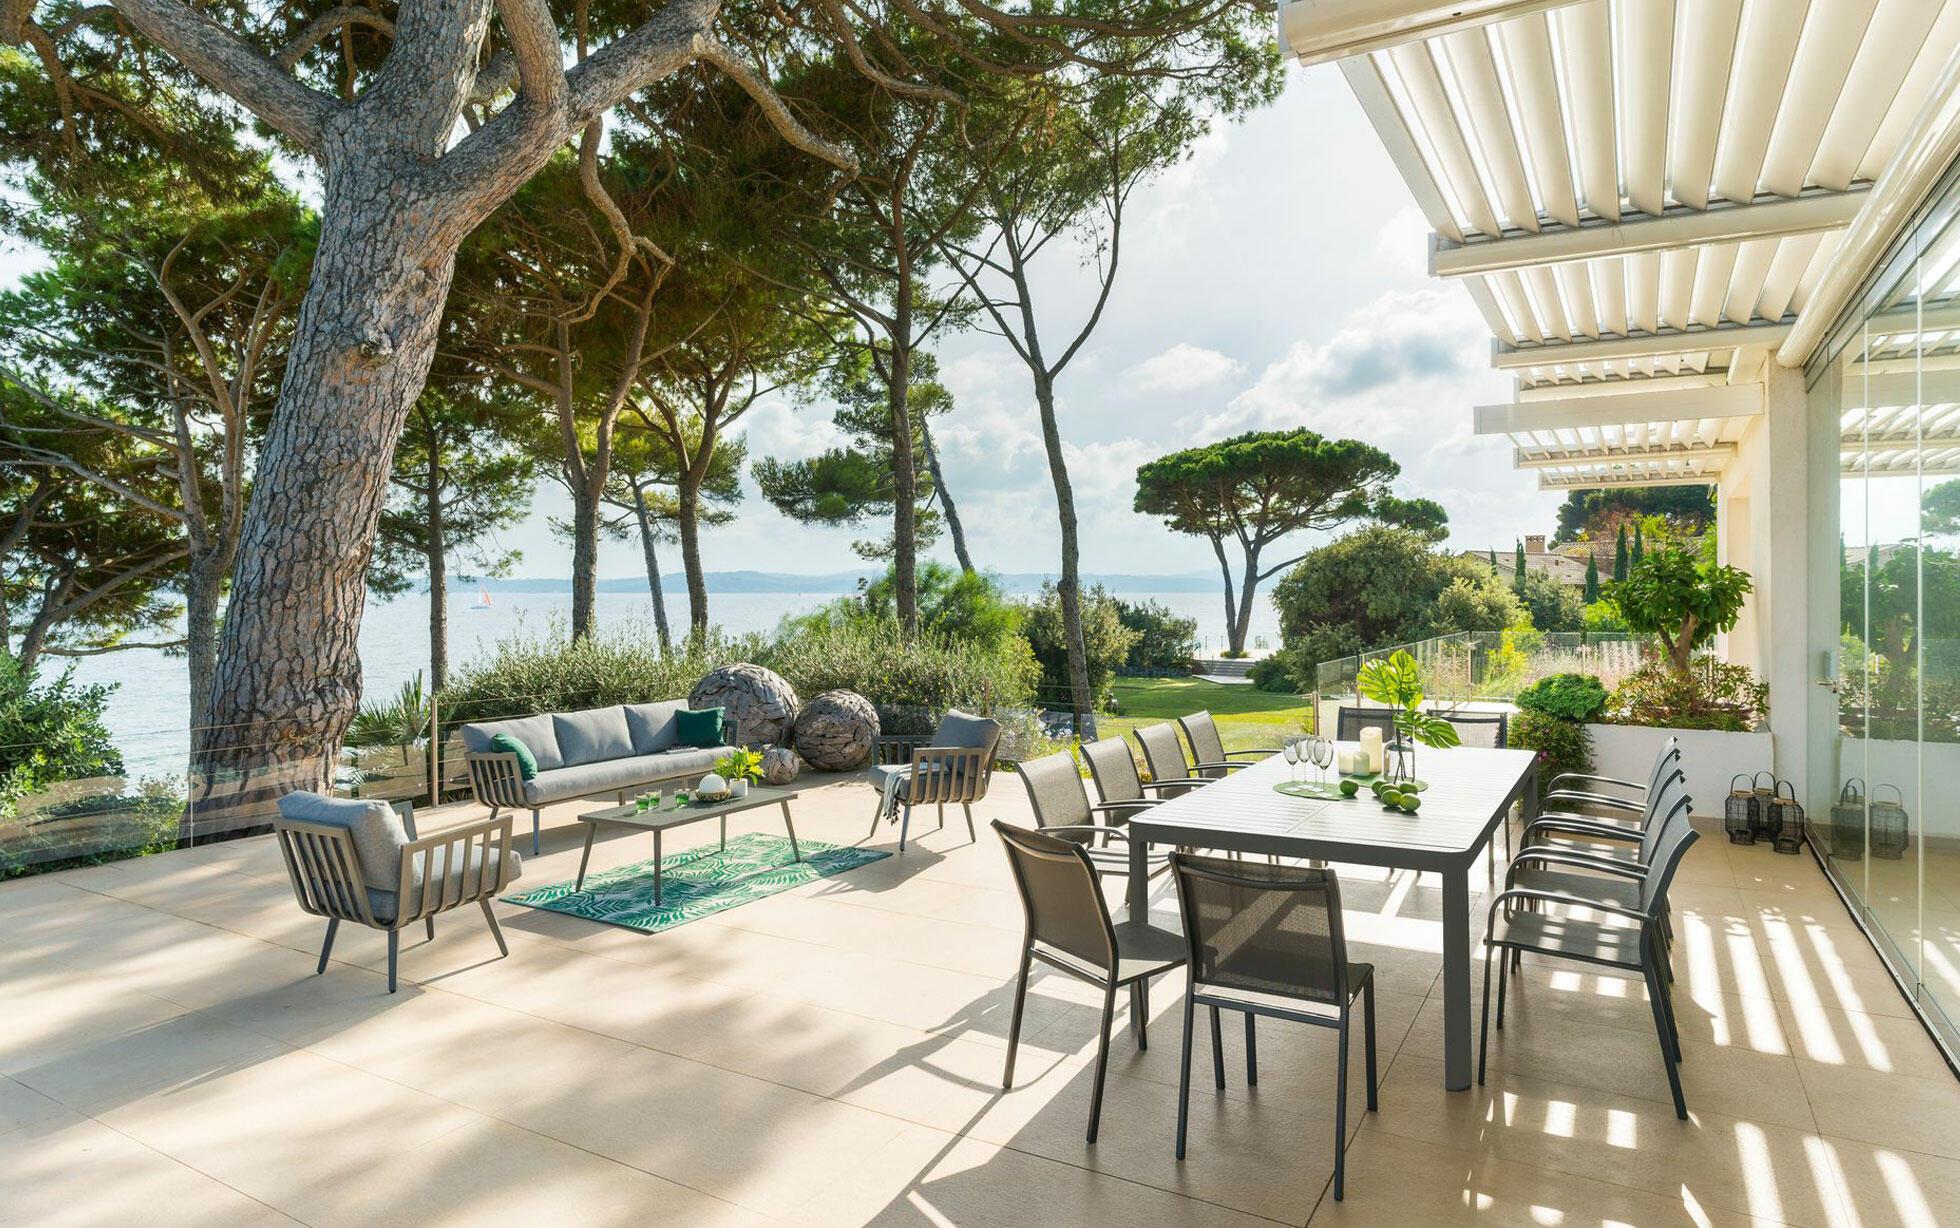 mobilier de jardin : avantage de l'aluminium